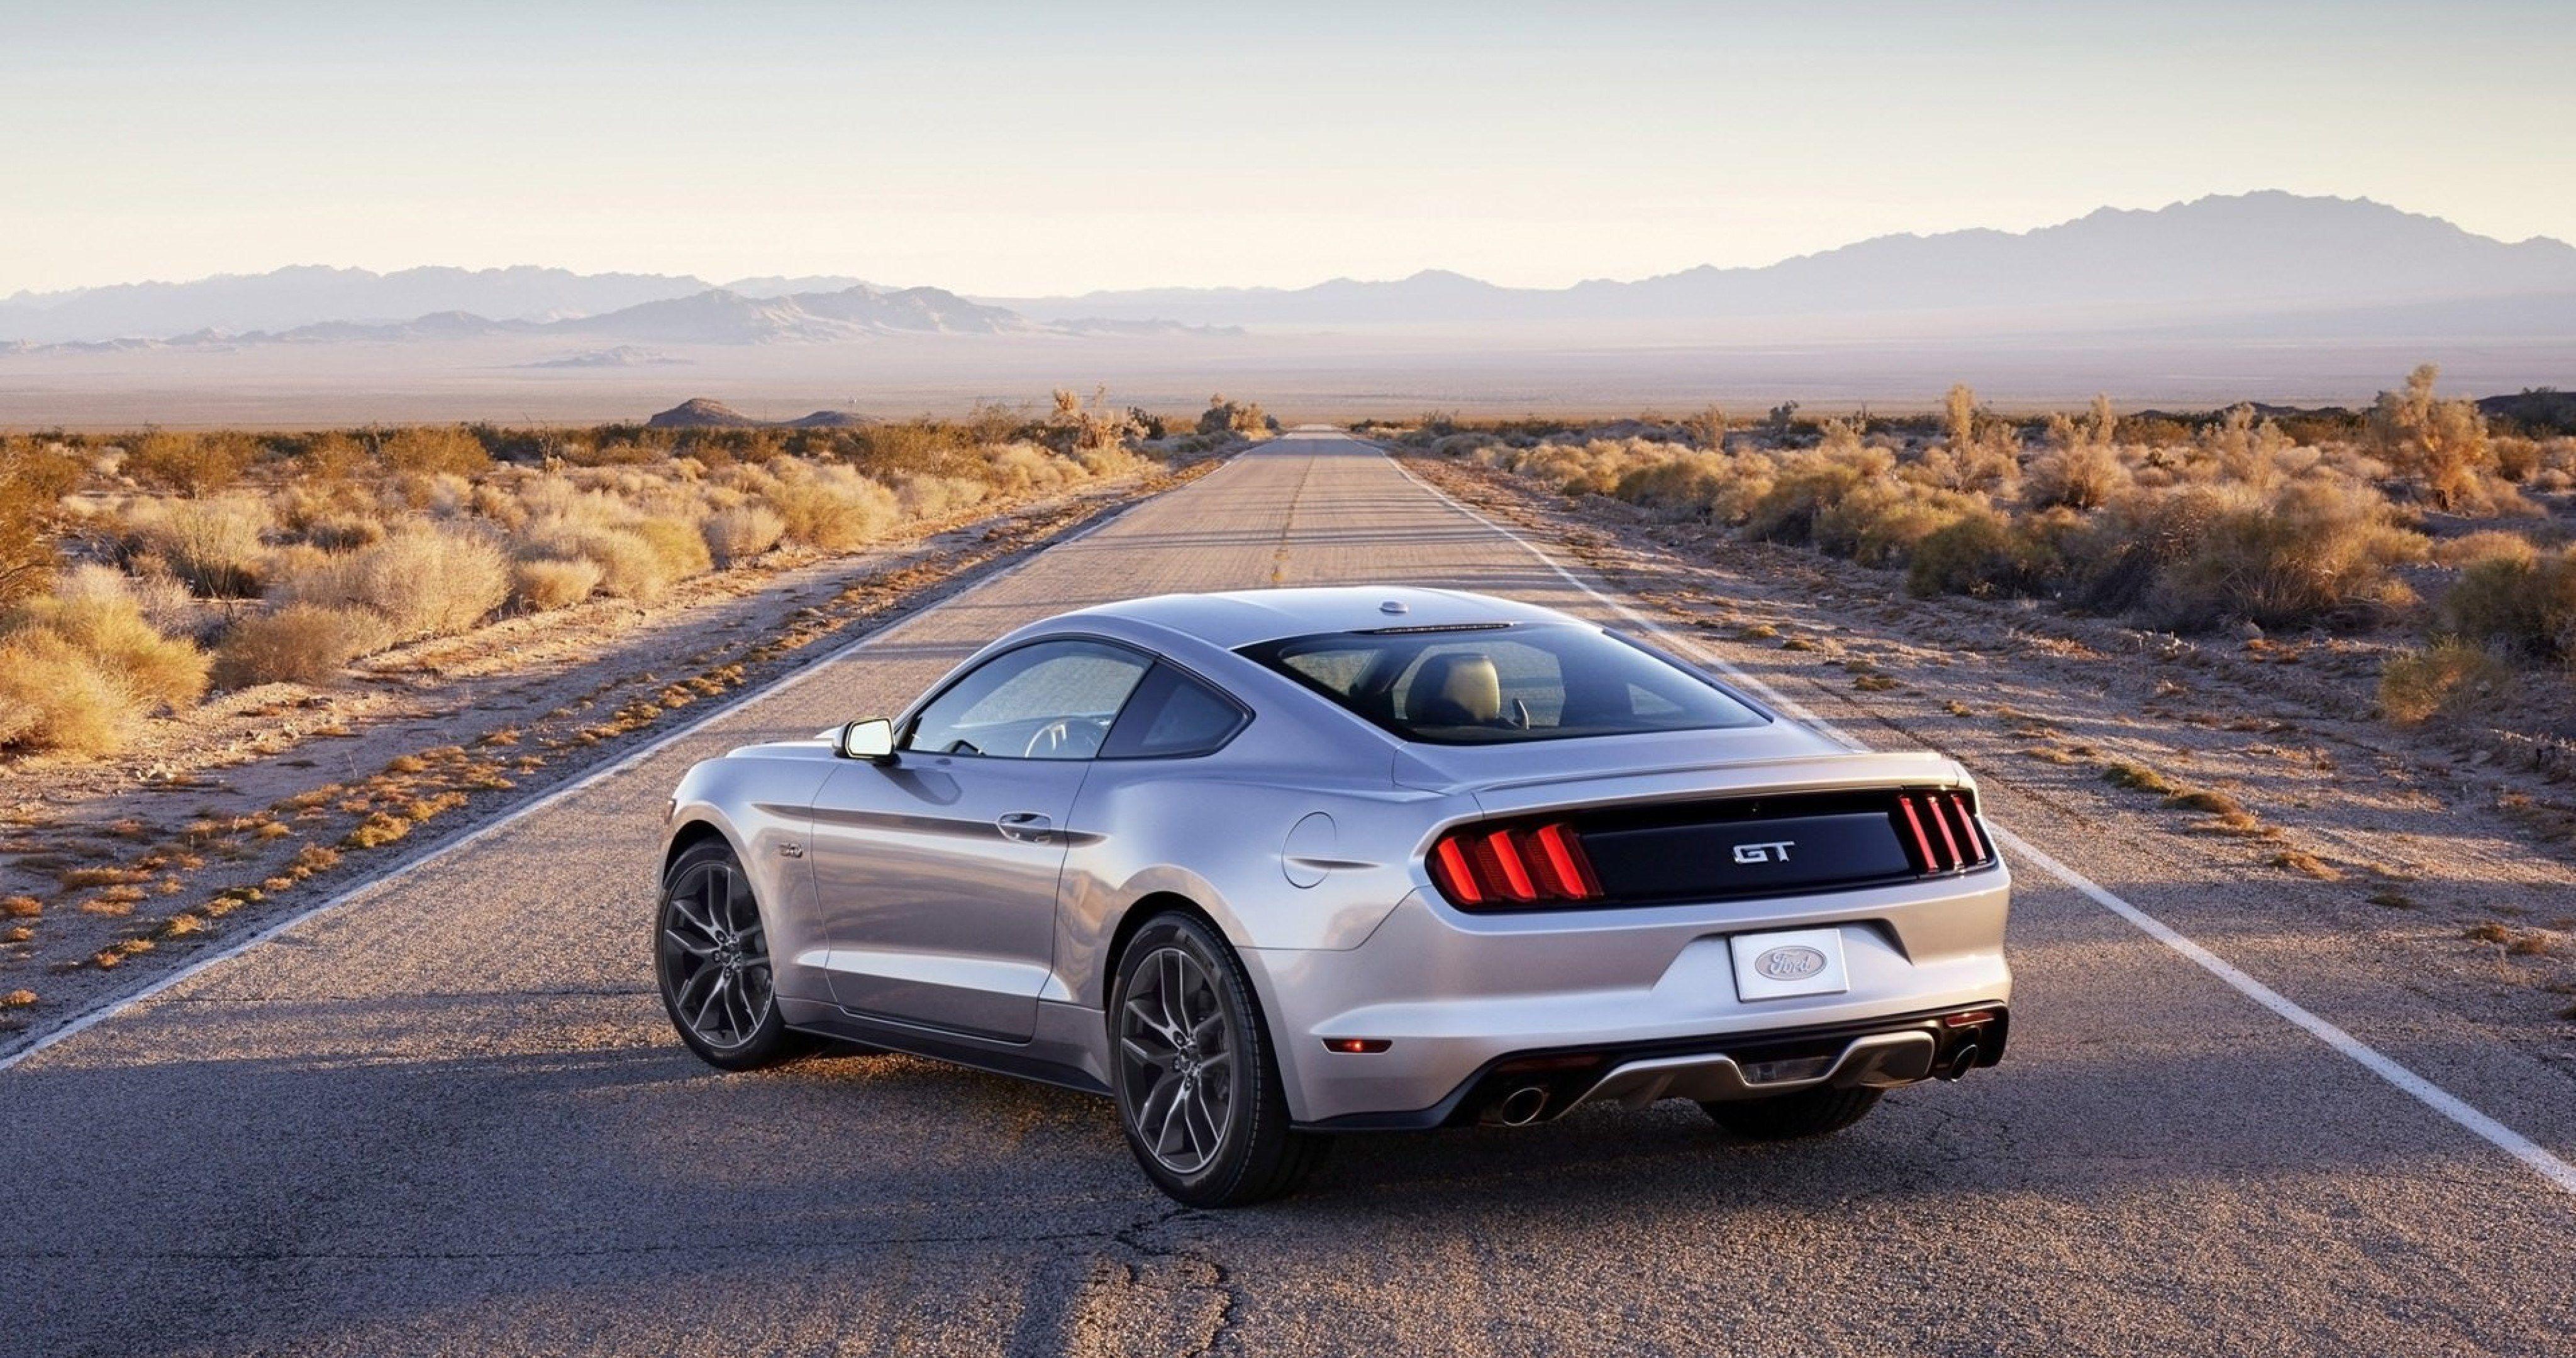 Ford Mustang Muscle Car 13 4k Ultra Hd Wallpaper Ololoshenka